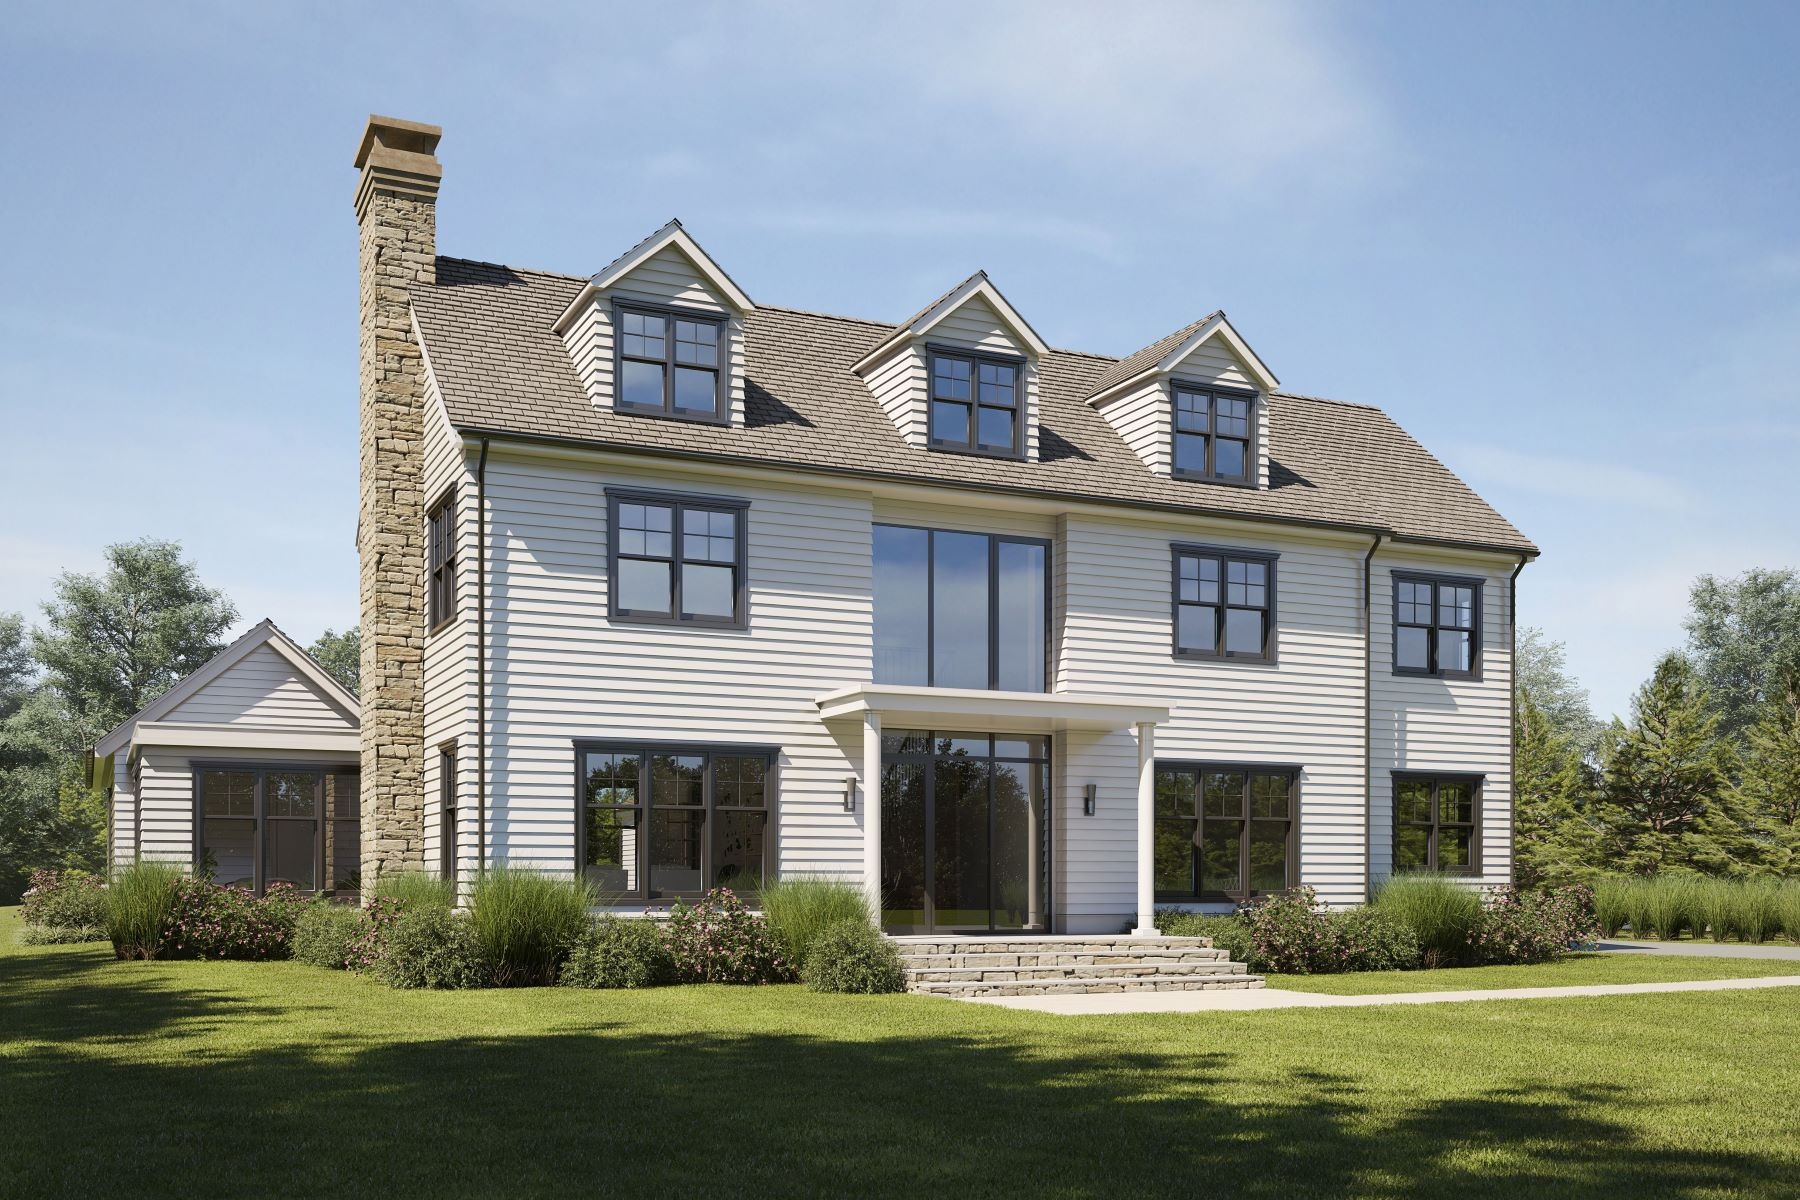 独户住宅 为 销售 在 New Construction Water View 766 Indian Avenue 米德尔敦, 02842 美国